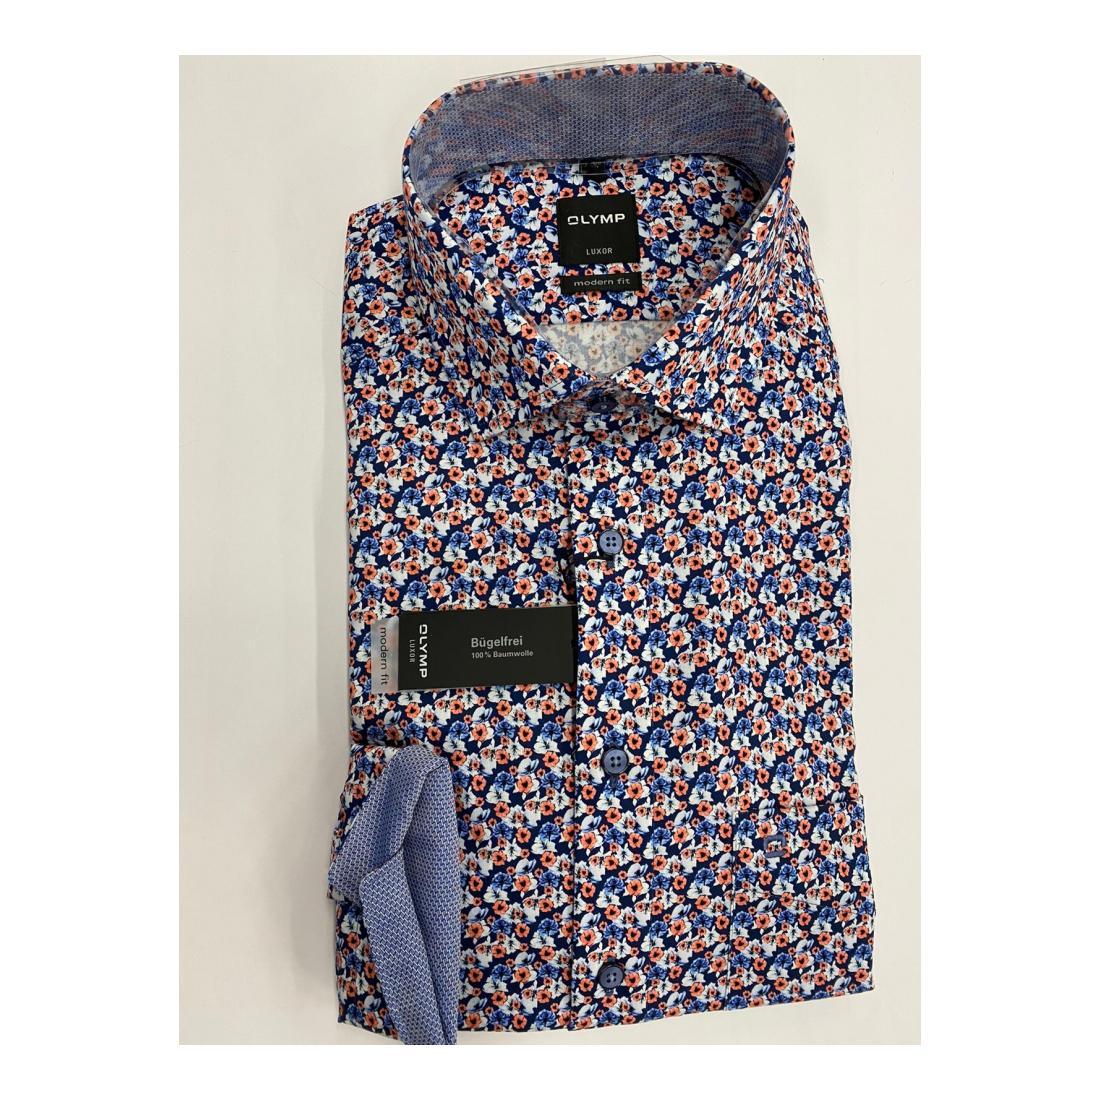 Olymp Business Hemden Herren 1254/54 Hemden